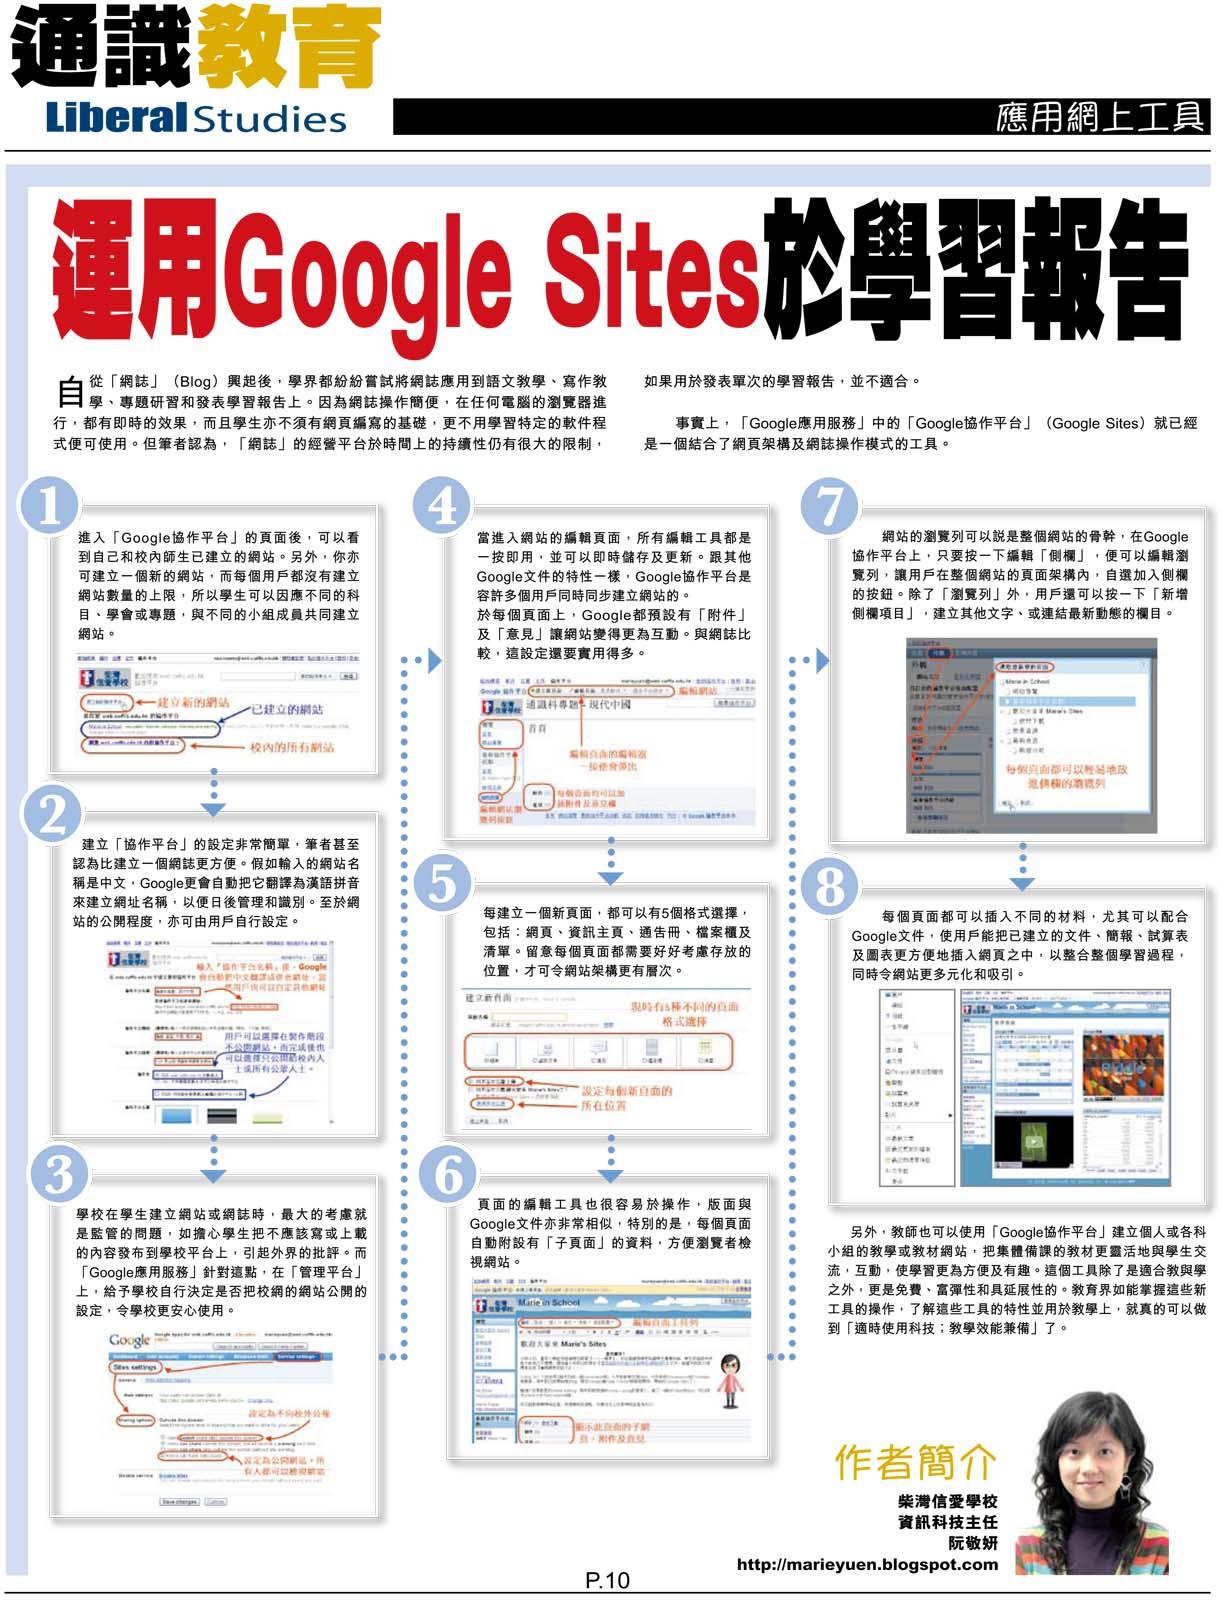 Google Sites_應用Google Sites於學習報告(經濟日報通識版154期)